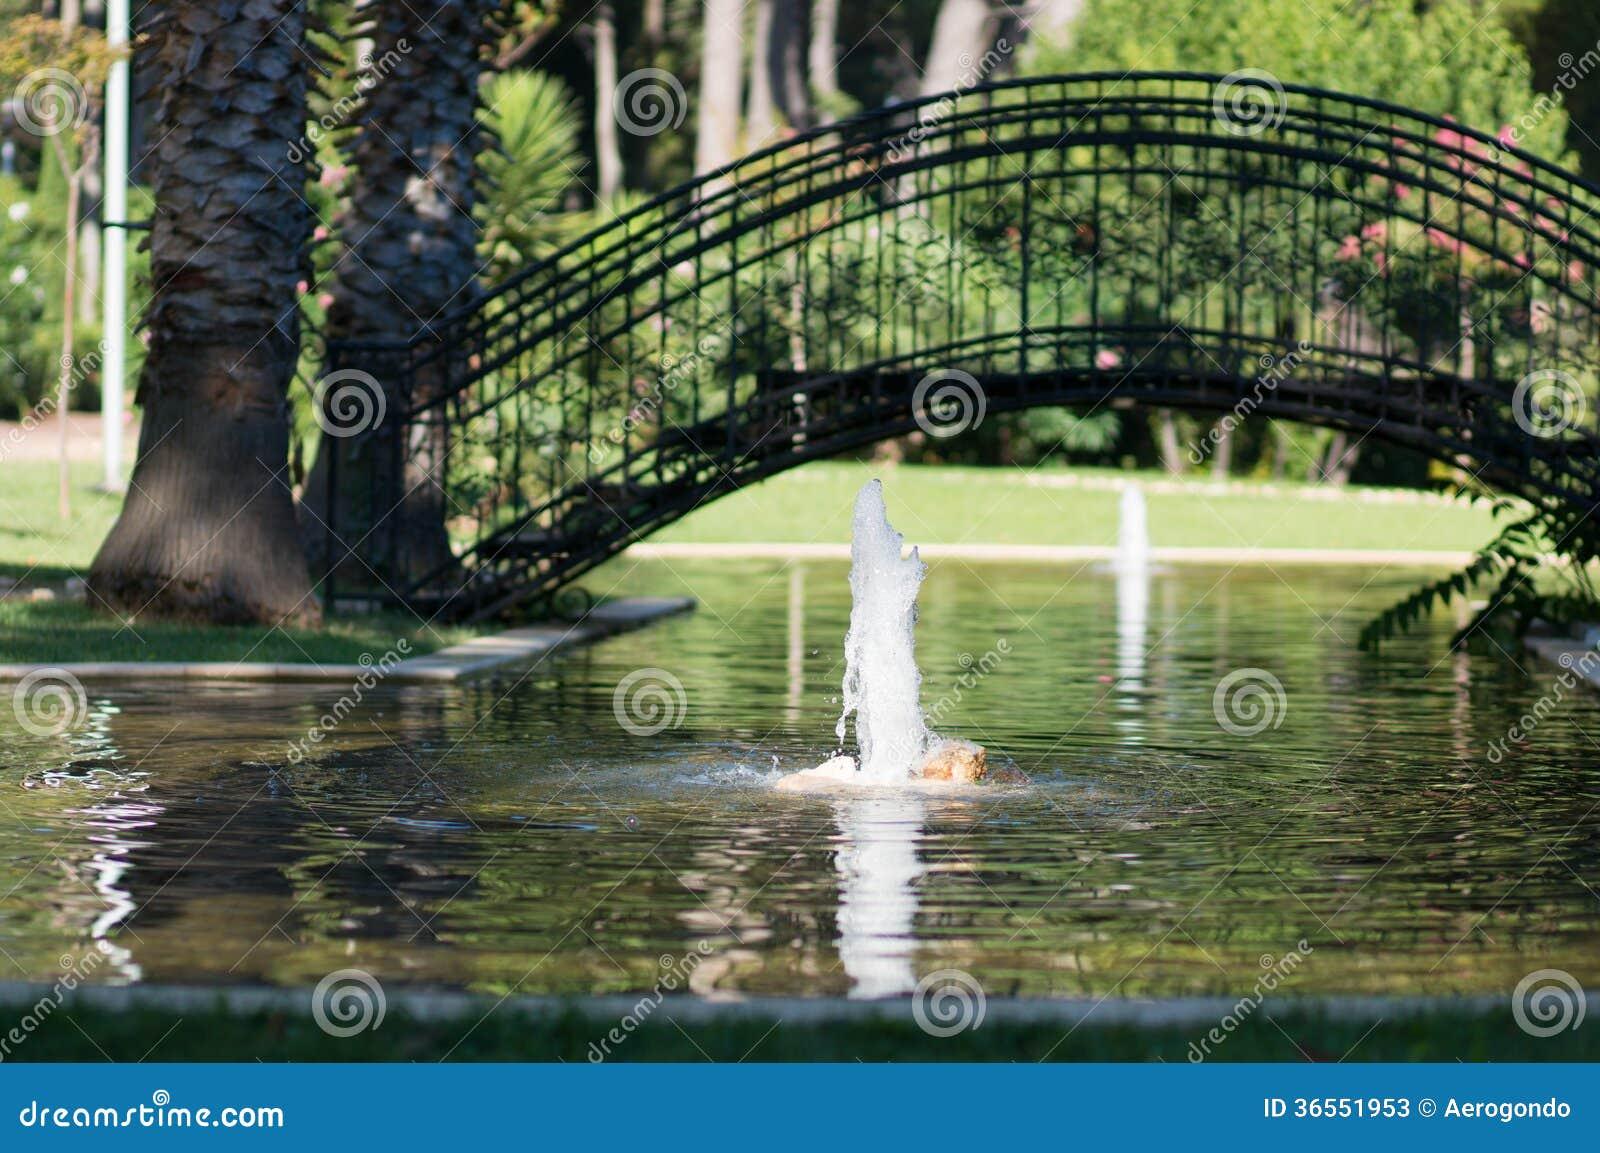 Garden with pond and bridge stock image image of for Garden pond bridge